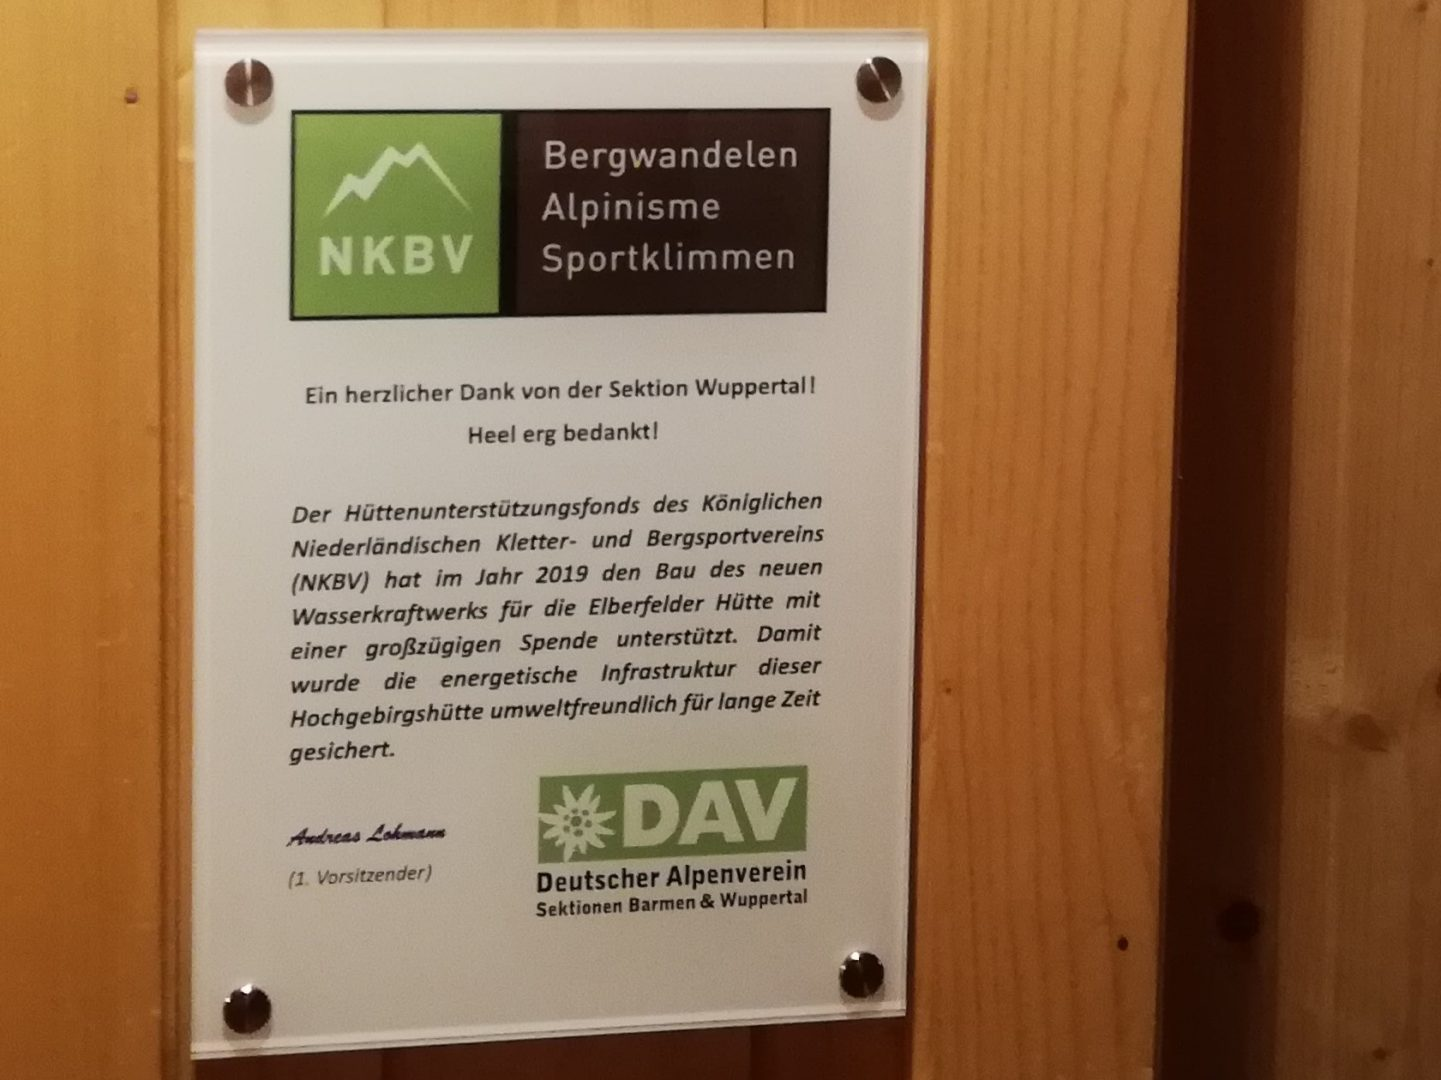 Elberfelder Hütte Spende vom NKBV